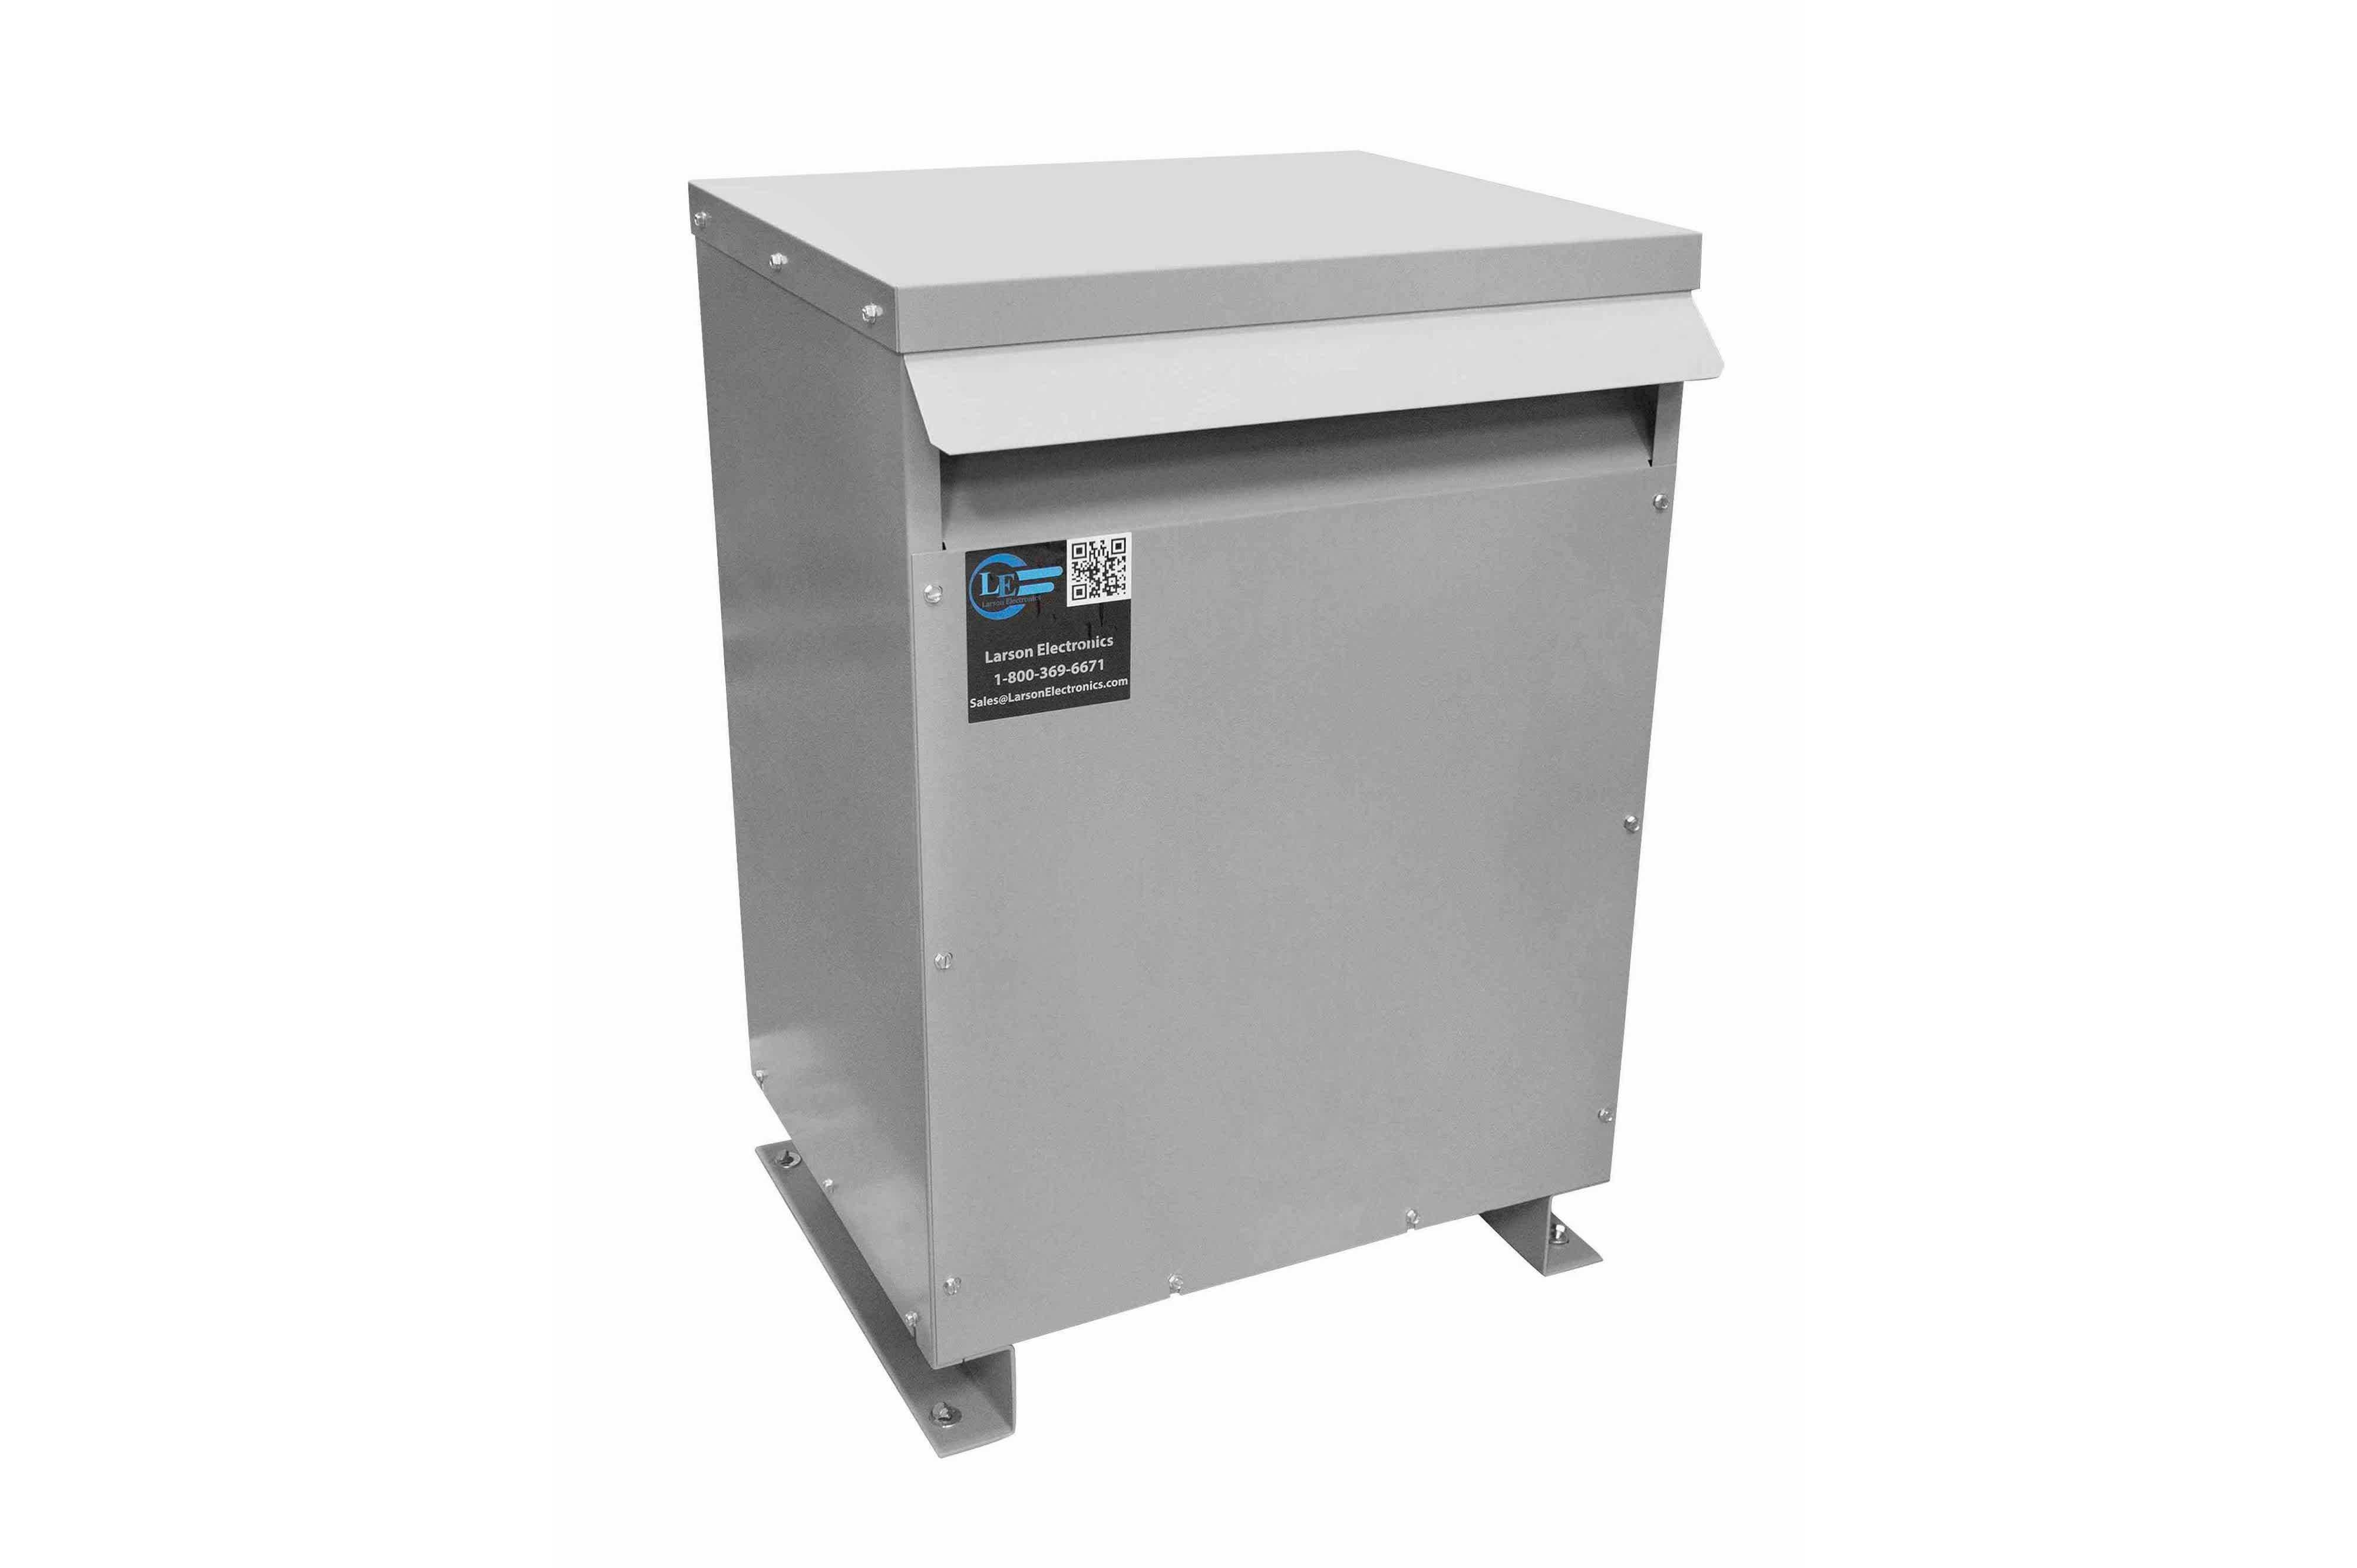 400 kVA 3PH Isolation Transformer, 415V Wye Primary, 600Y/347 Wye-N Secondary, N3R, Ventilated, 60 Hz